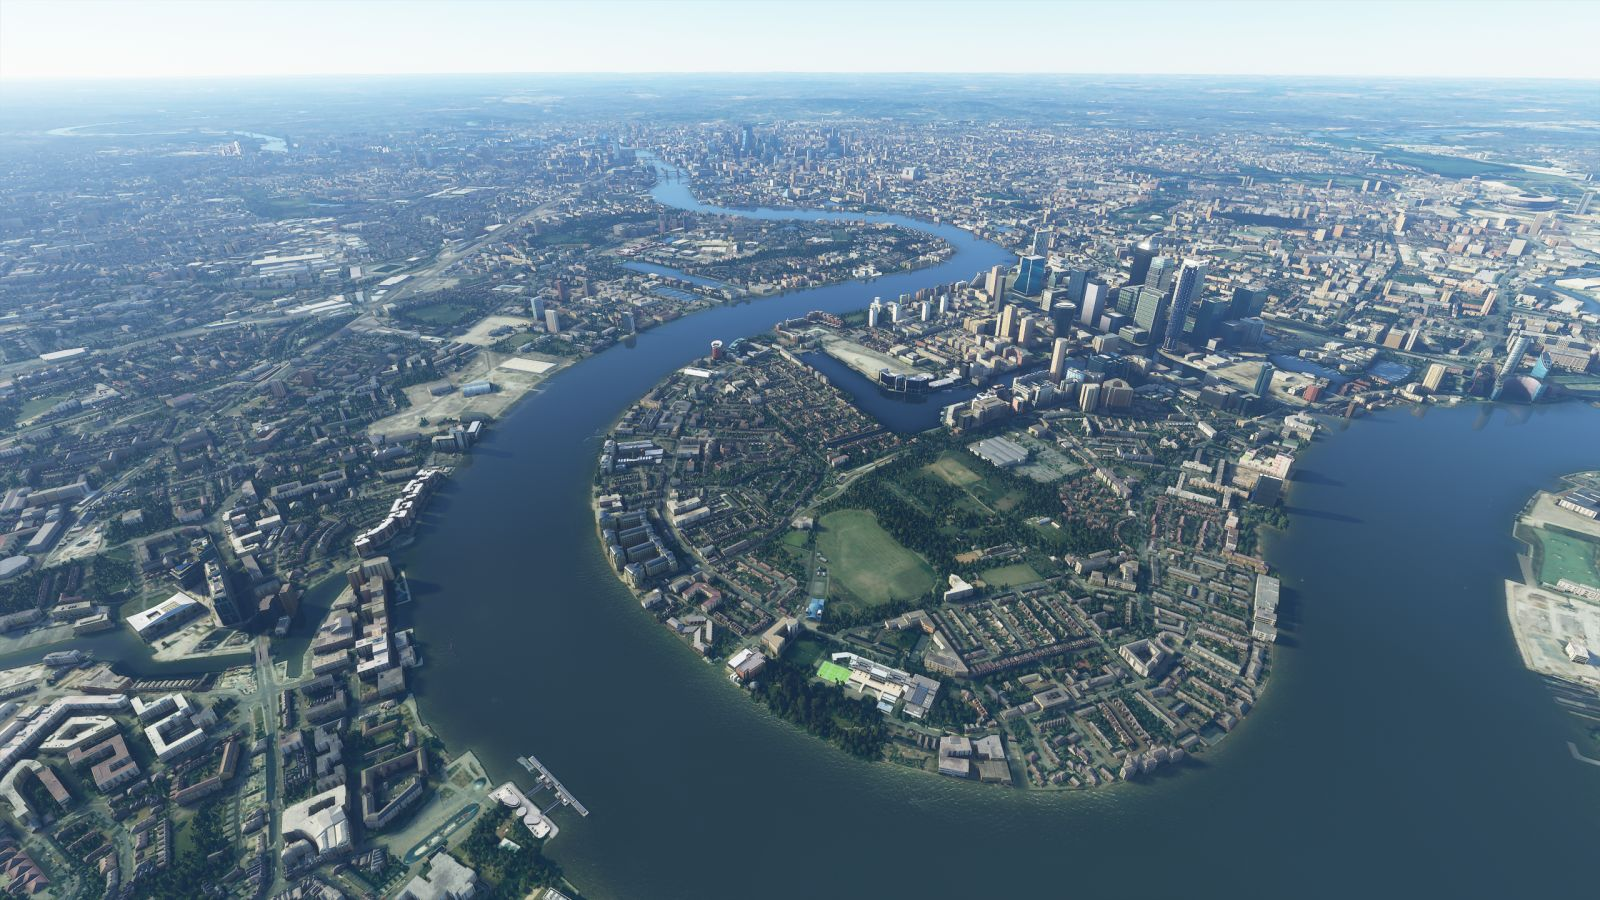 MSFS_LondonCity_055